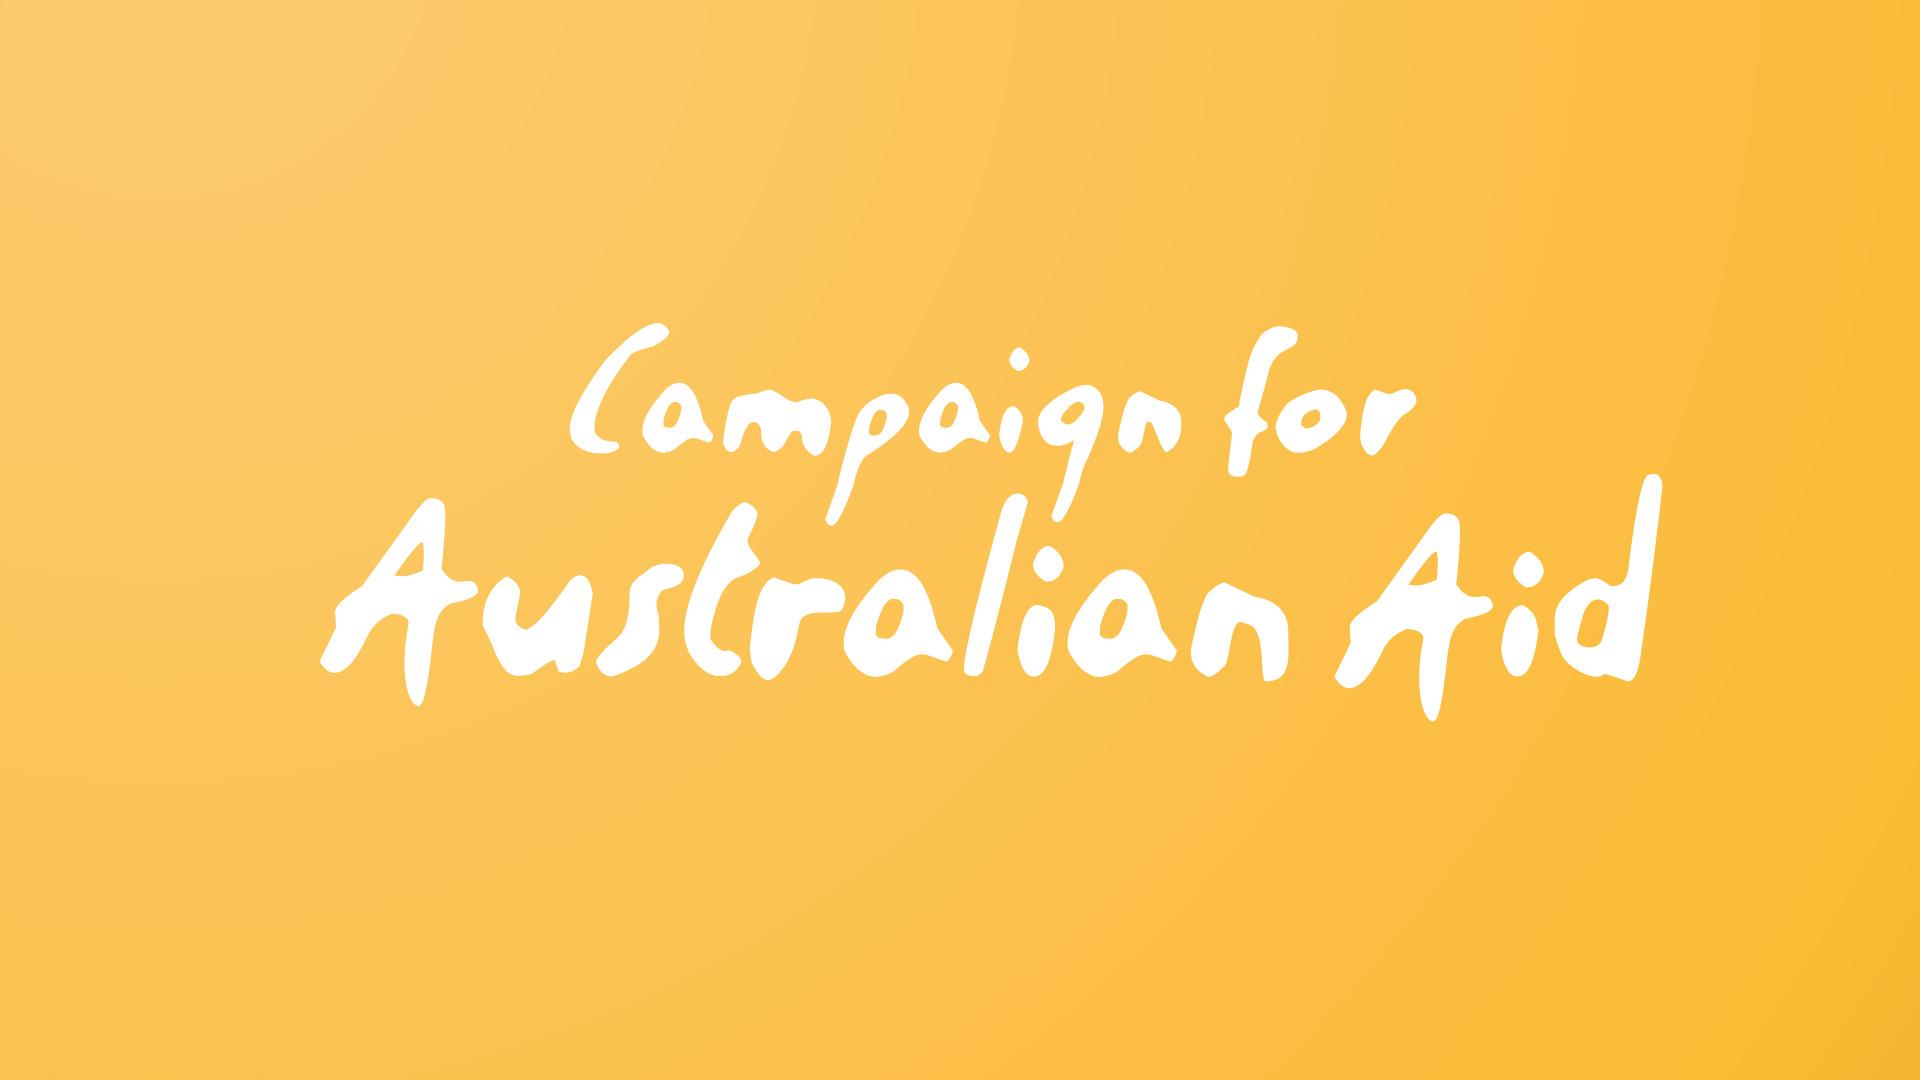 Campaign for Australian Aid